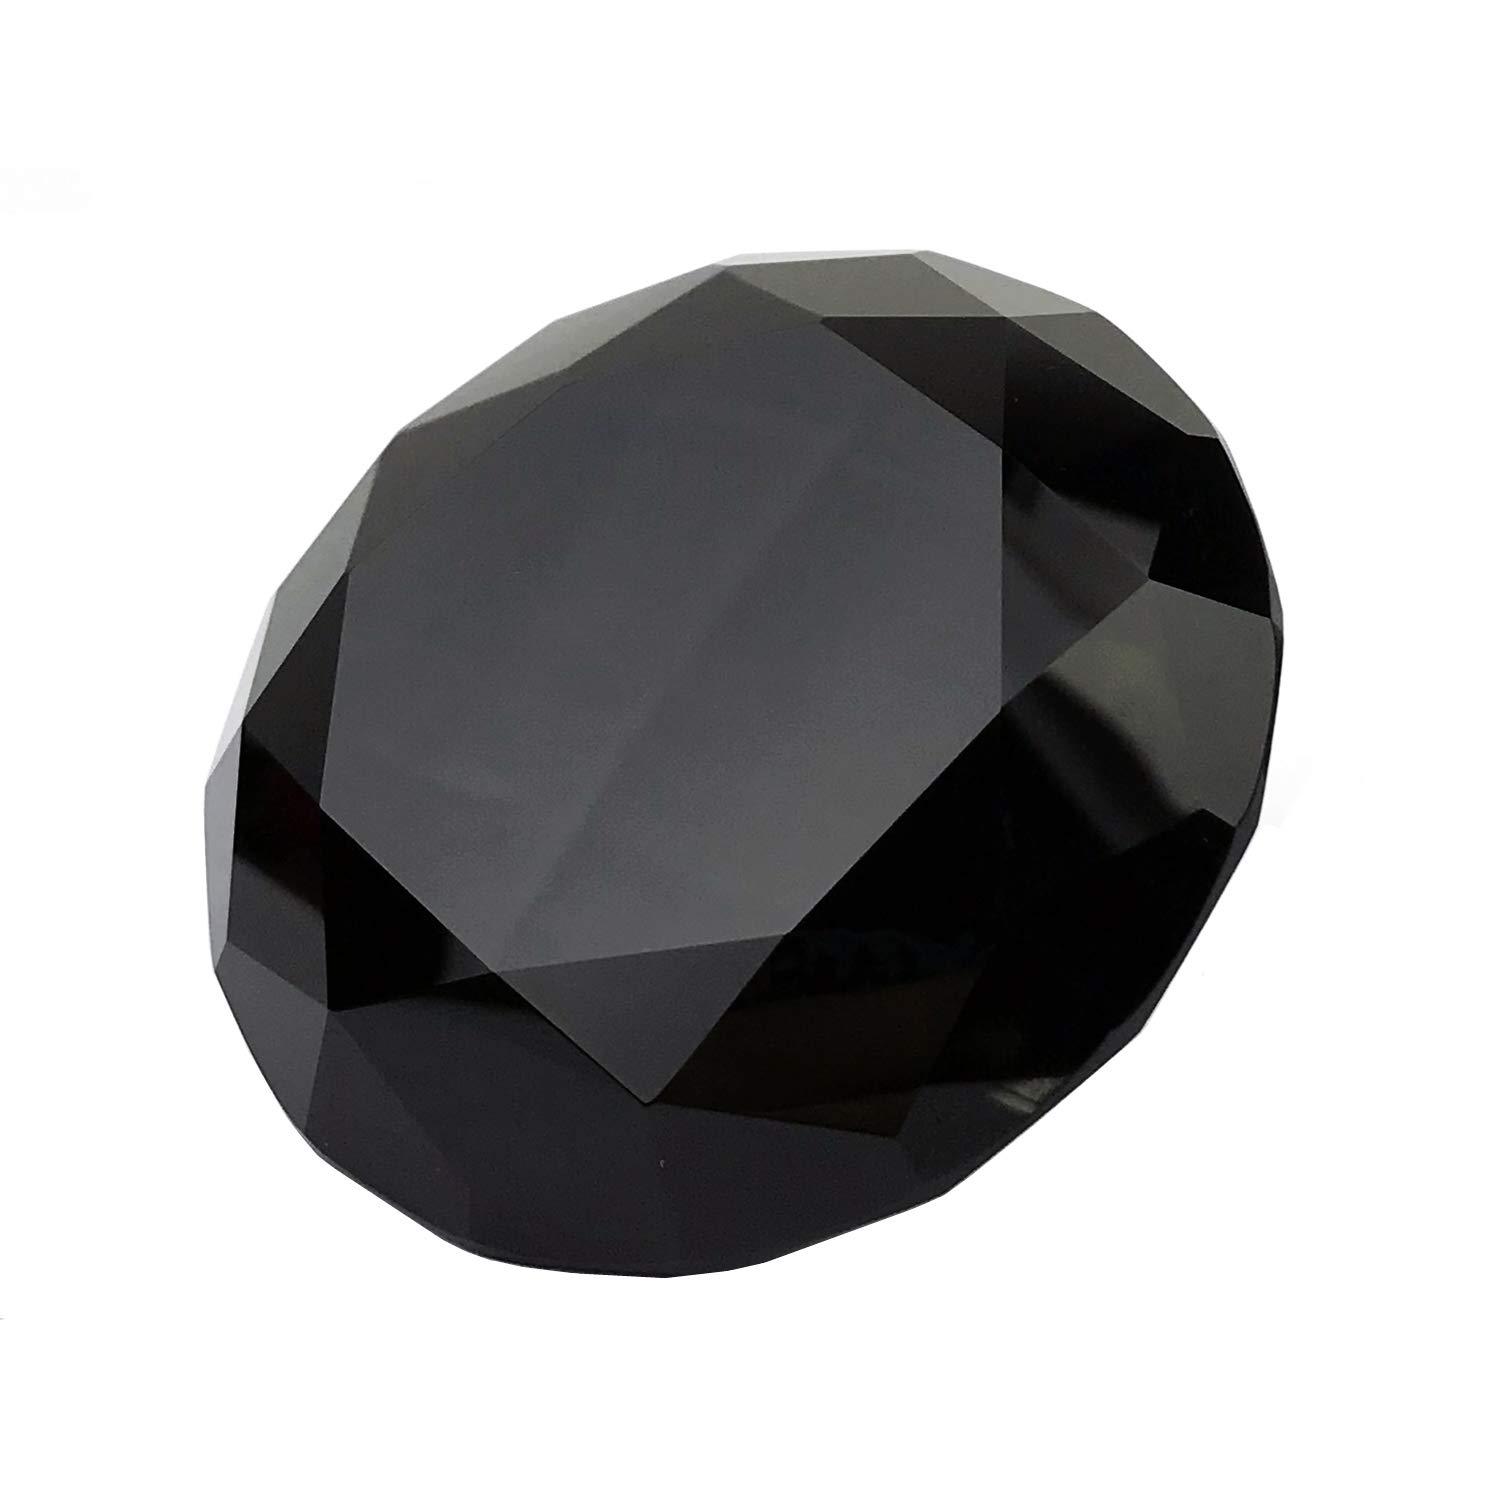 Black Crystal 80mm Jewel Paperweight Glass Diamond Decorations Giant Diamond Prop Wedding Home Decor by Chnee